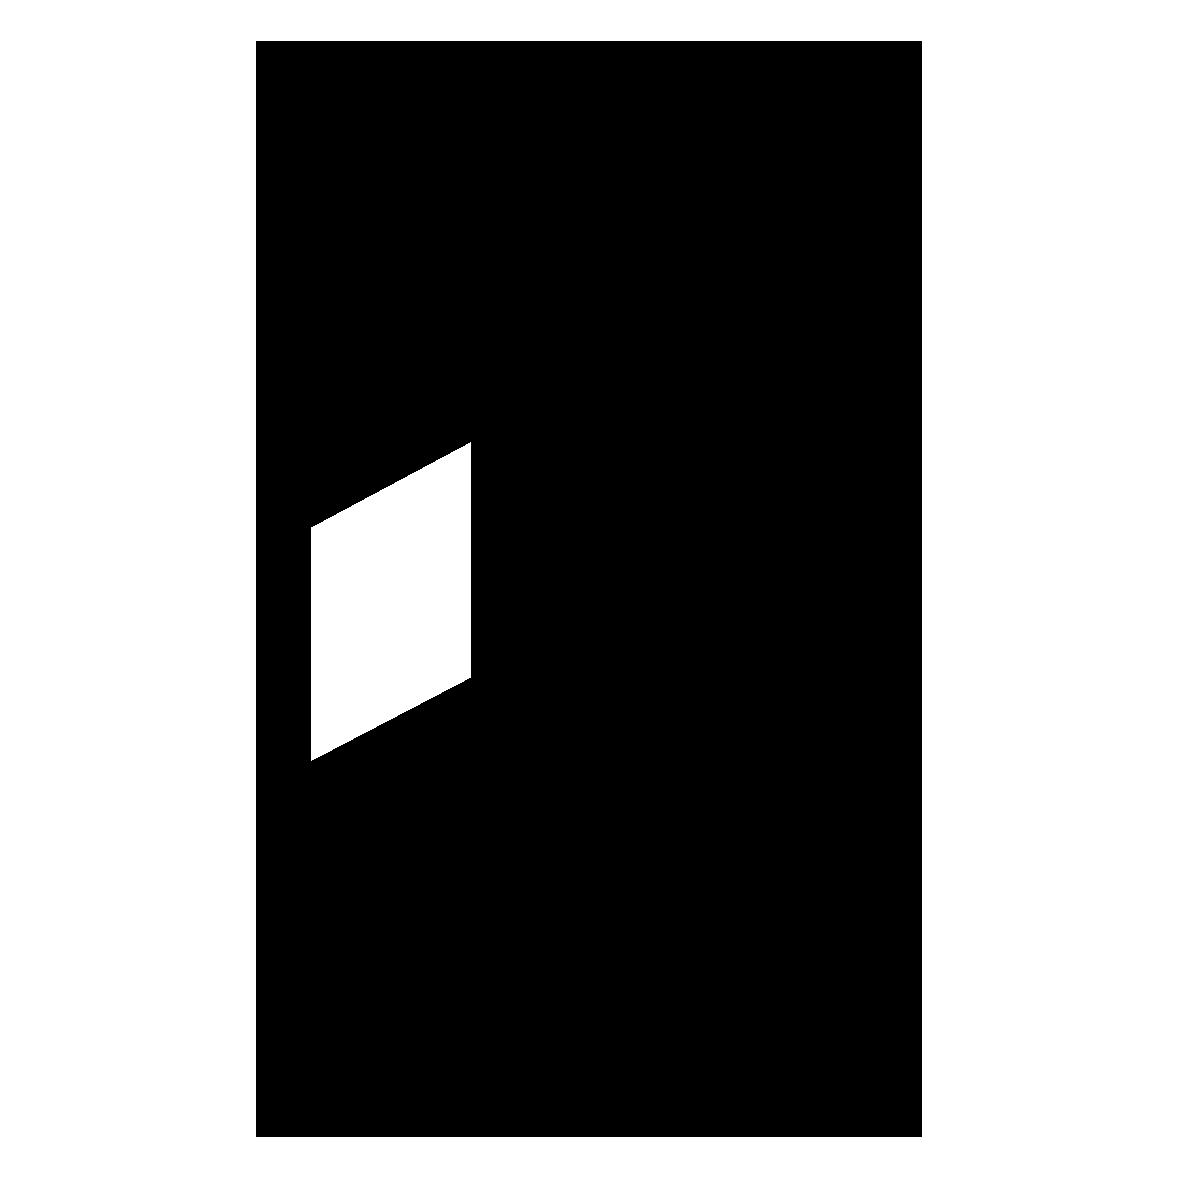 Préférence Logo QLF de PNL (Marukito) by MaruuEU on DeviantArt TG34